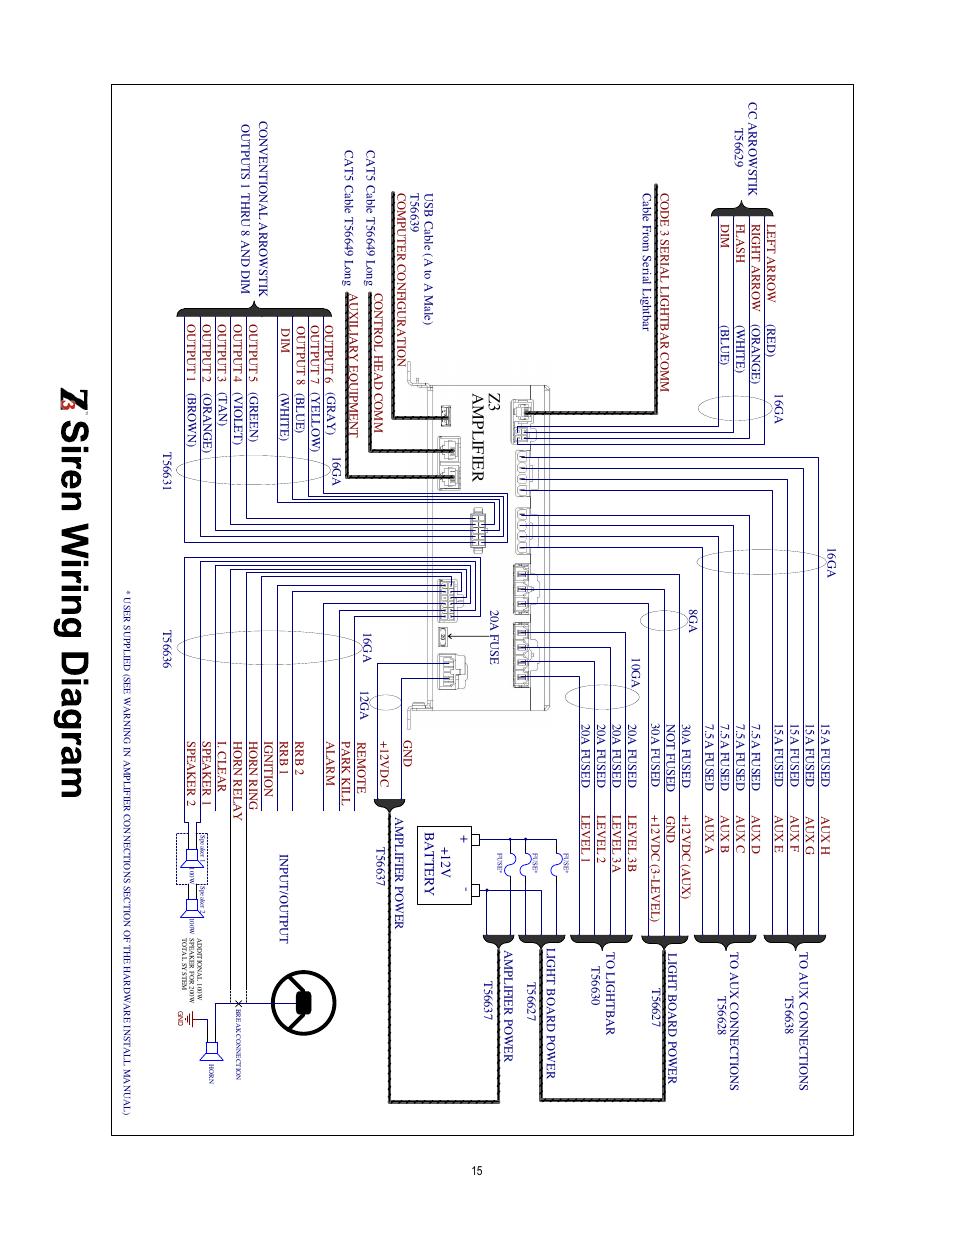 code 3 siren wiring diagram - leviton gfci switch wiring diagram for wiring  diagram schematics  wiring diagram schematics